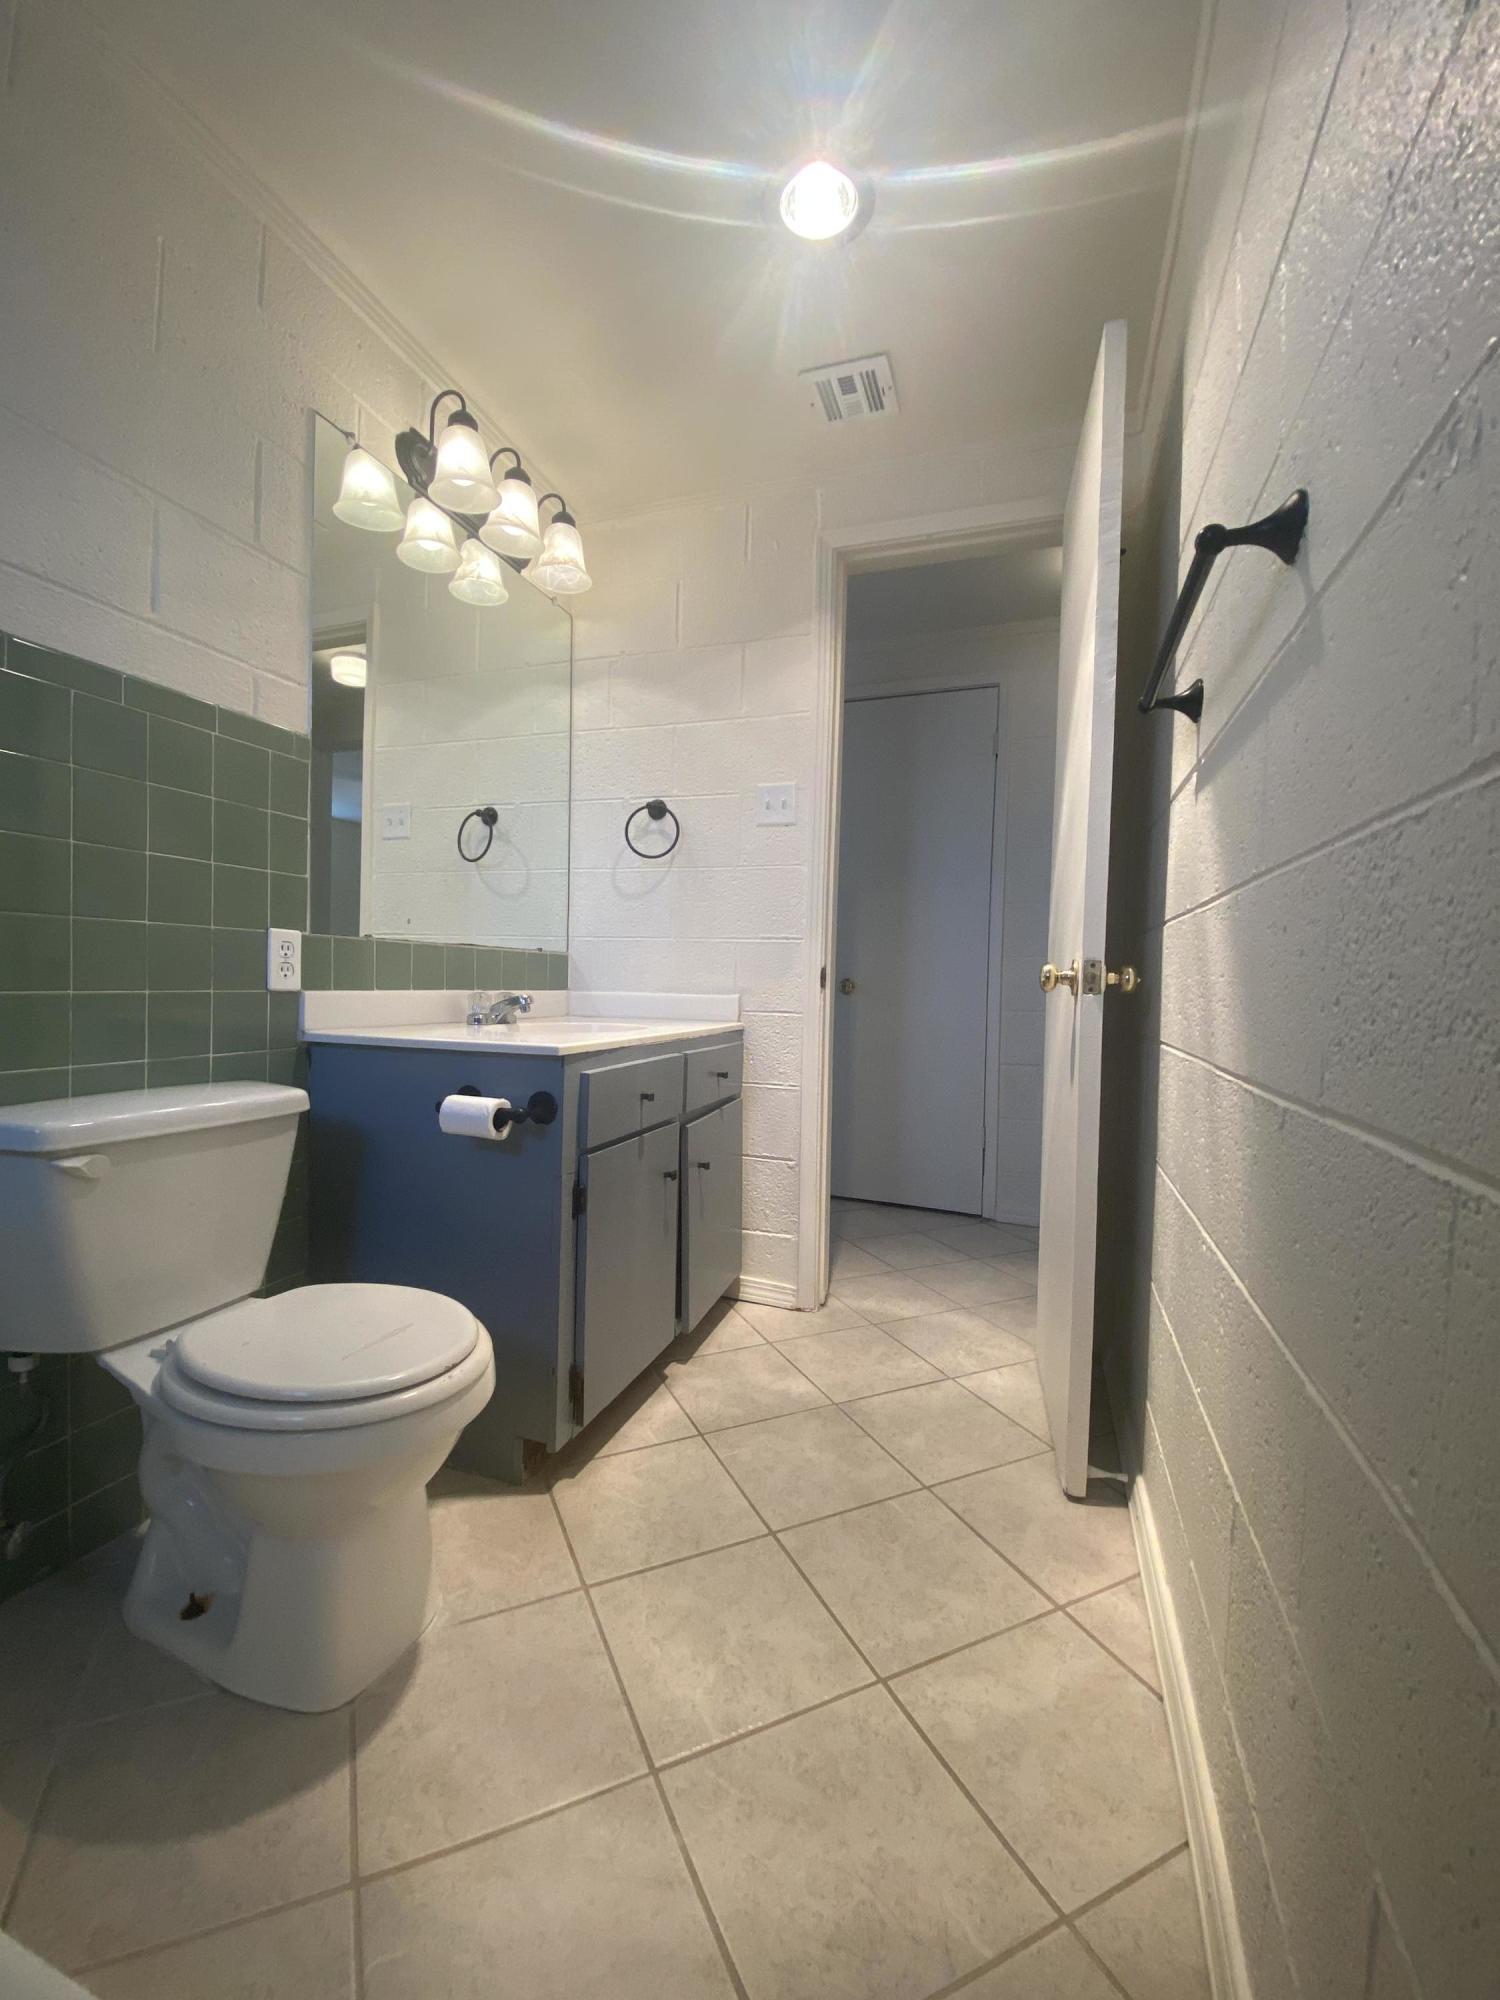 3705 Hercules Avenue, El Paso, Texas 79904, 2 Bedrooms Bedrooms, ,1 BathroomBathrooms,Residential Rental,For Rent,Hercules,836925